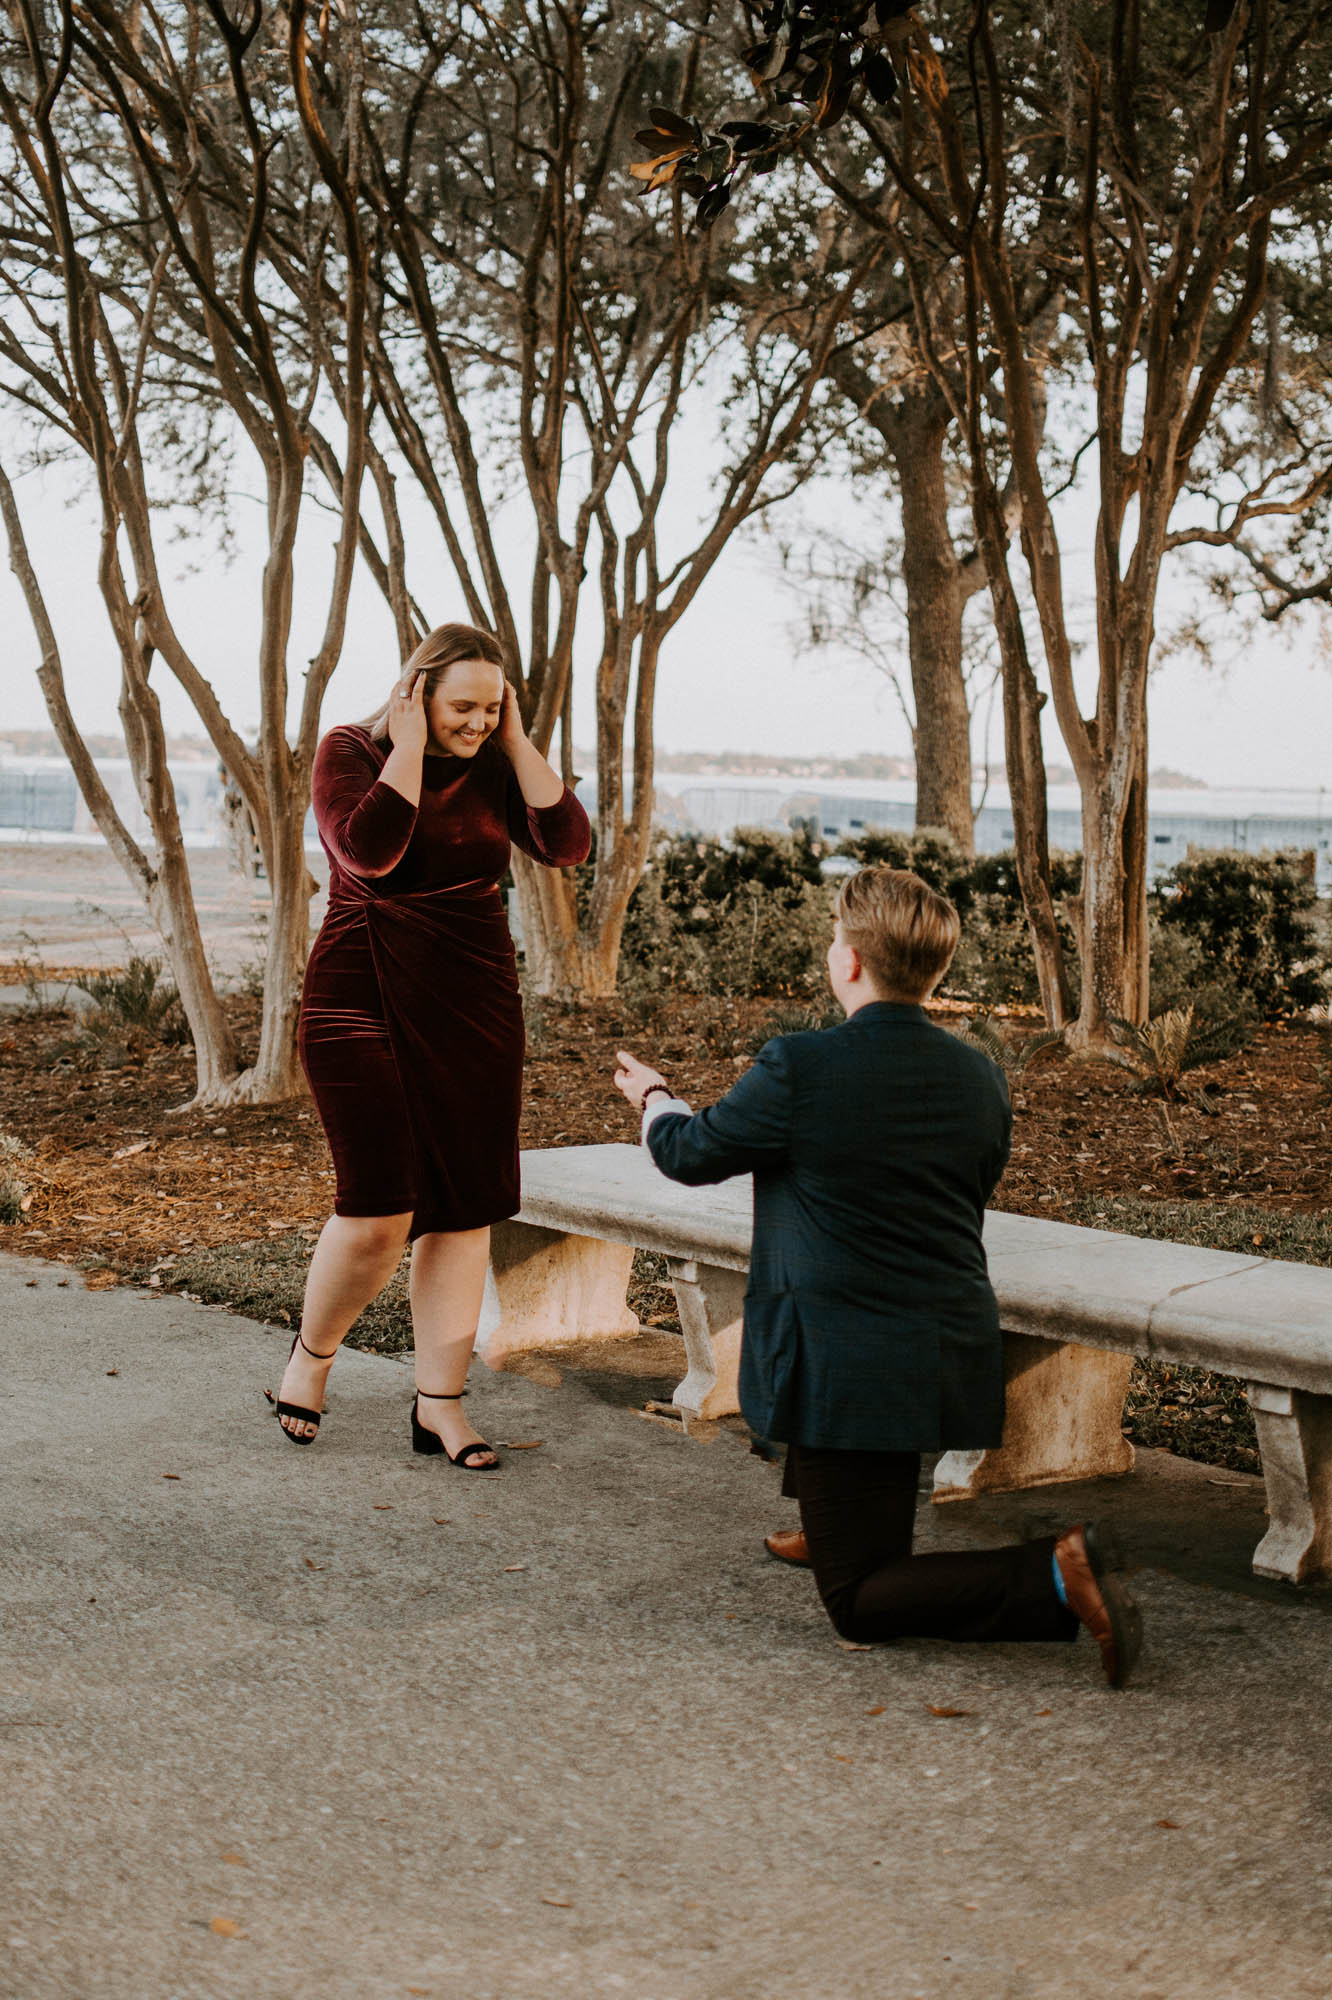 Queer Park Proposal - Engagement Photography Session - Yazi Davis - LGBTQ